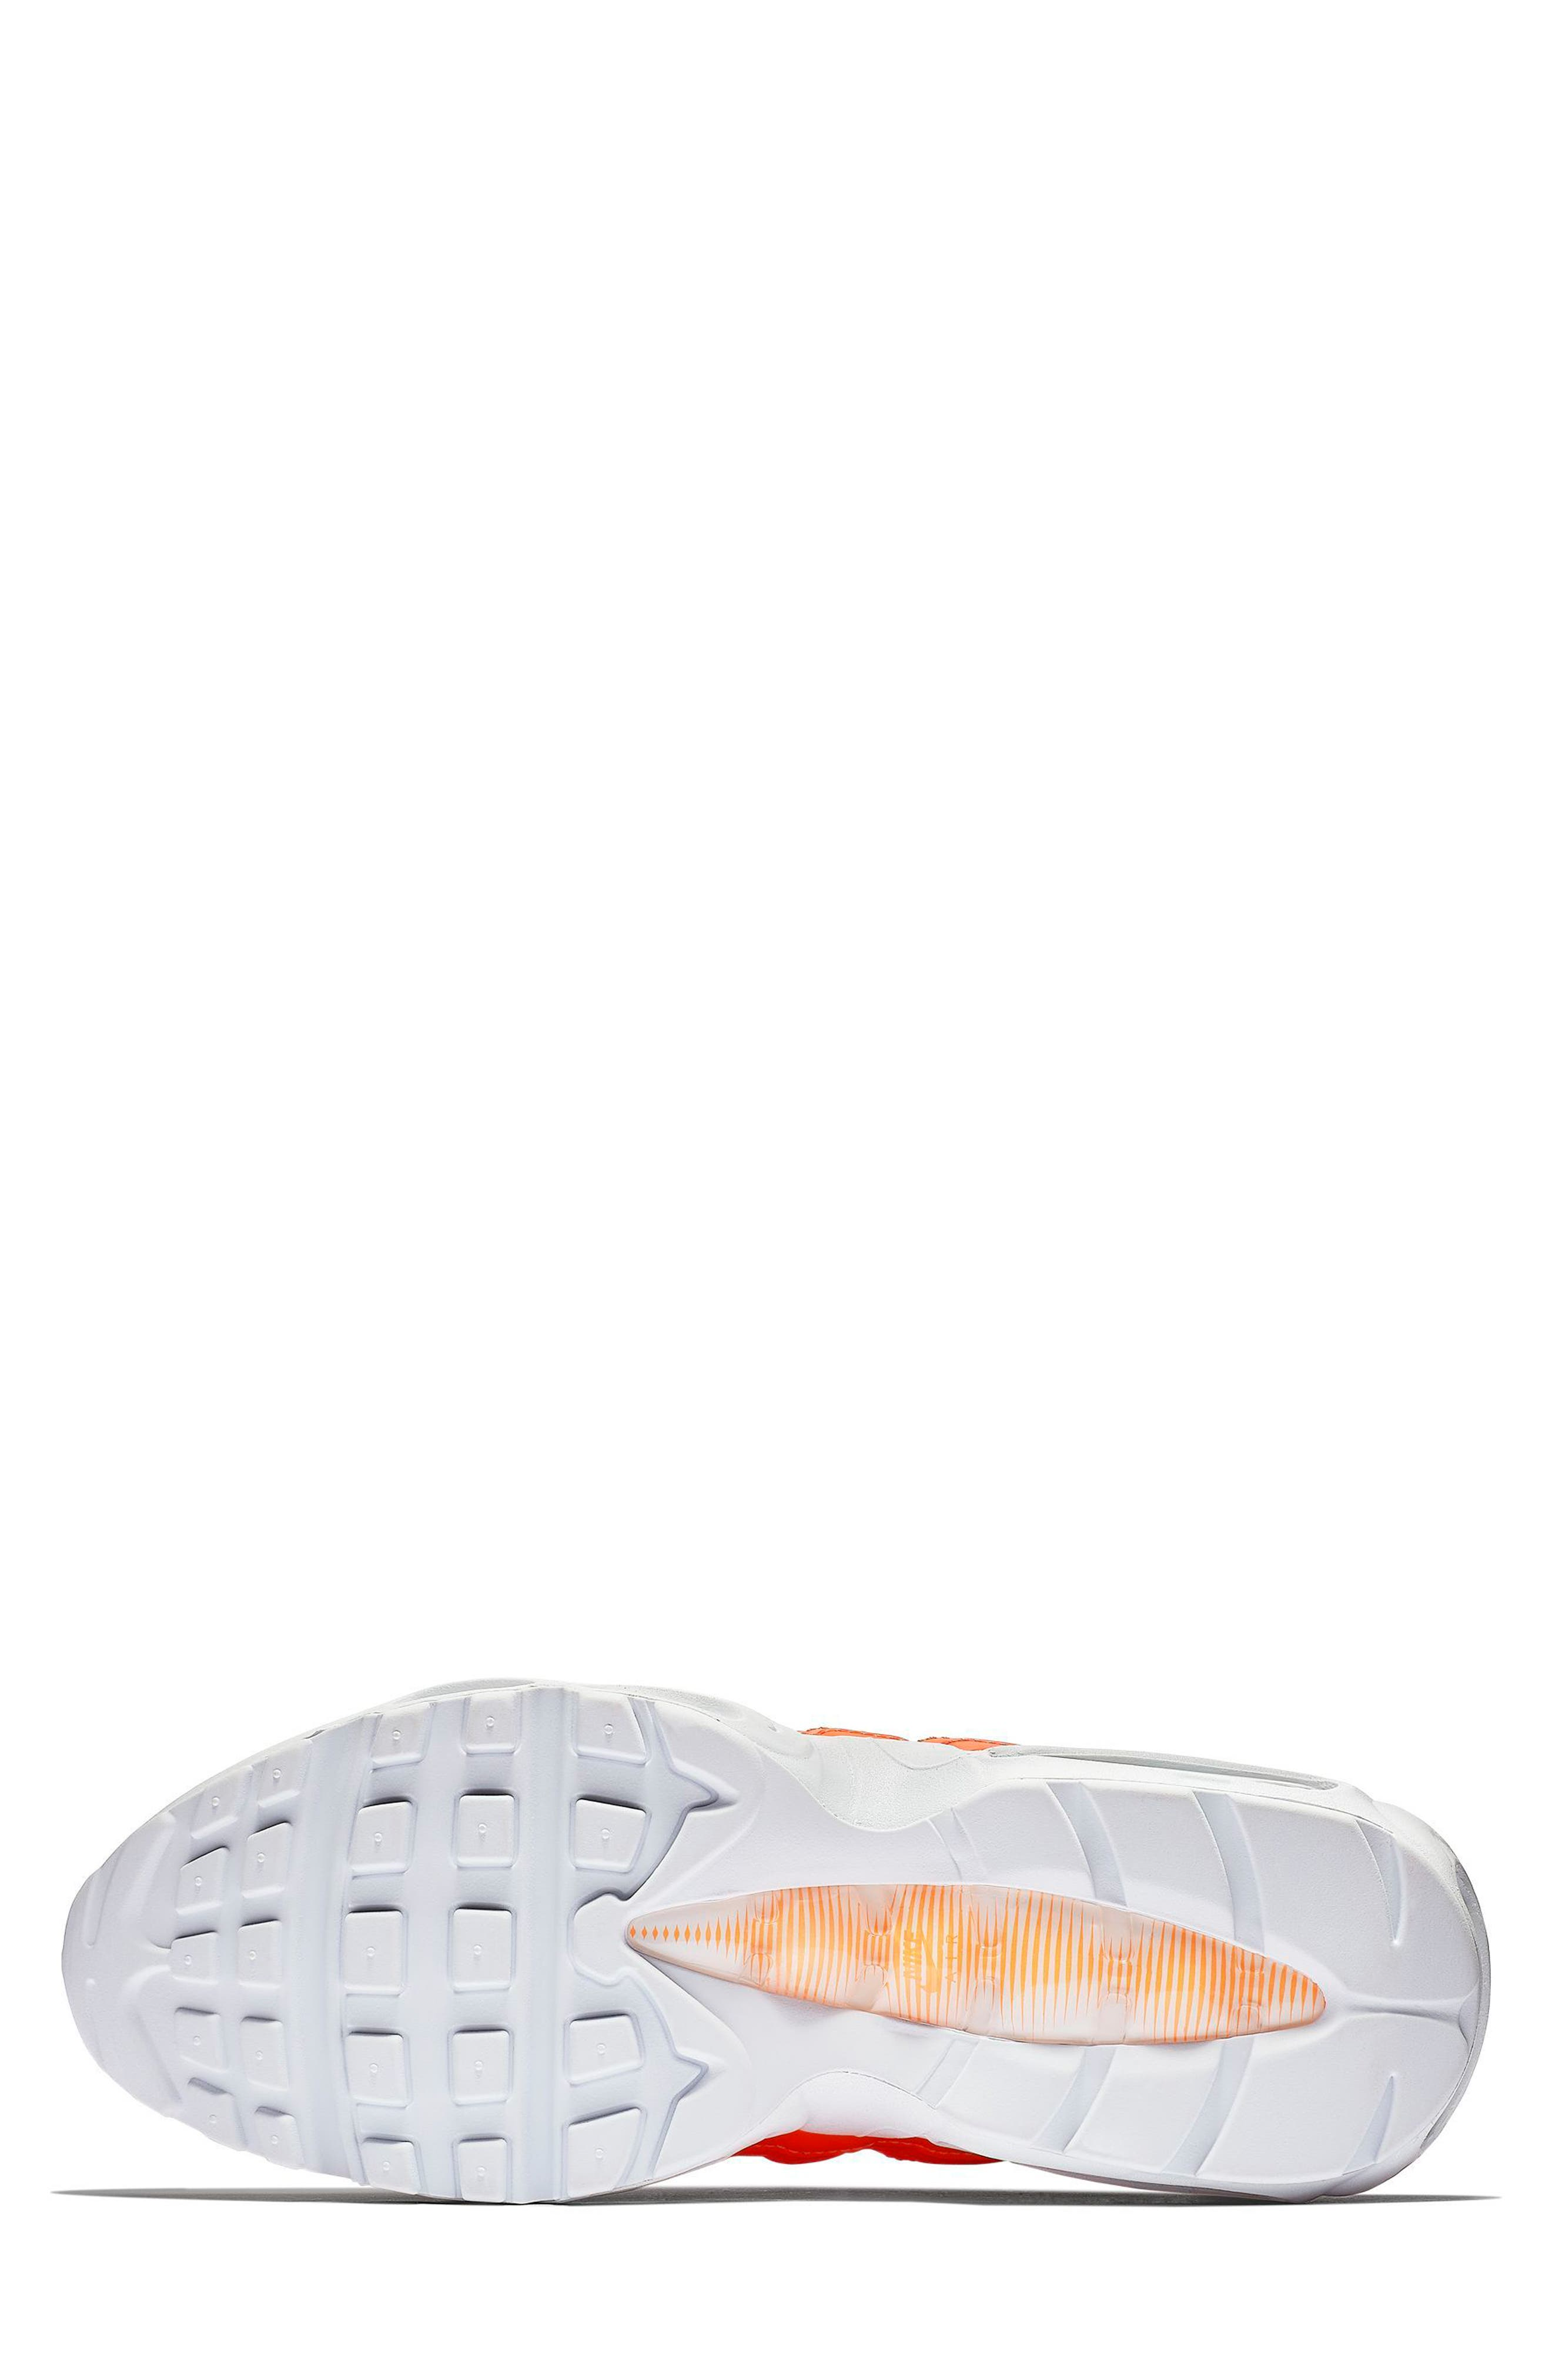 Air Max 95 SE Running Shoe,                             Alternate thumbnail 5, color,                             ORANGE/ WHT-BLK